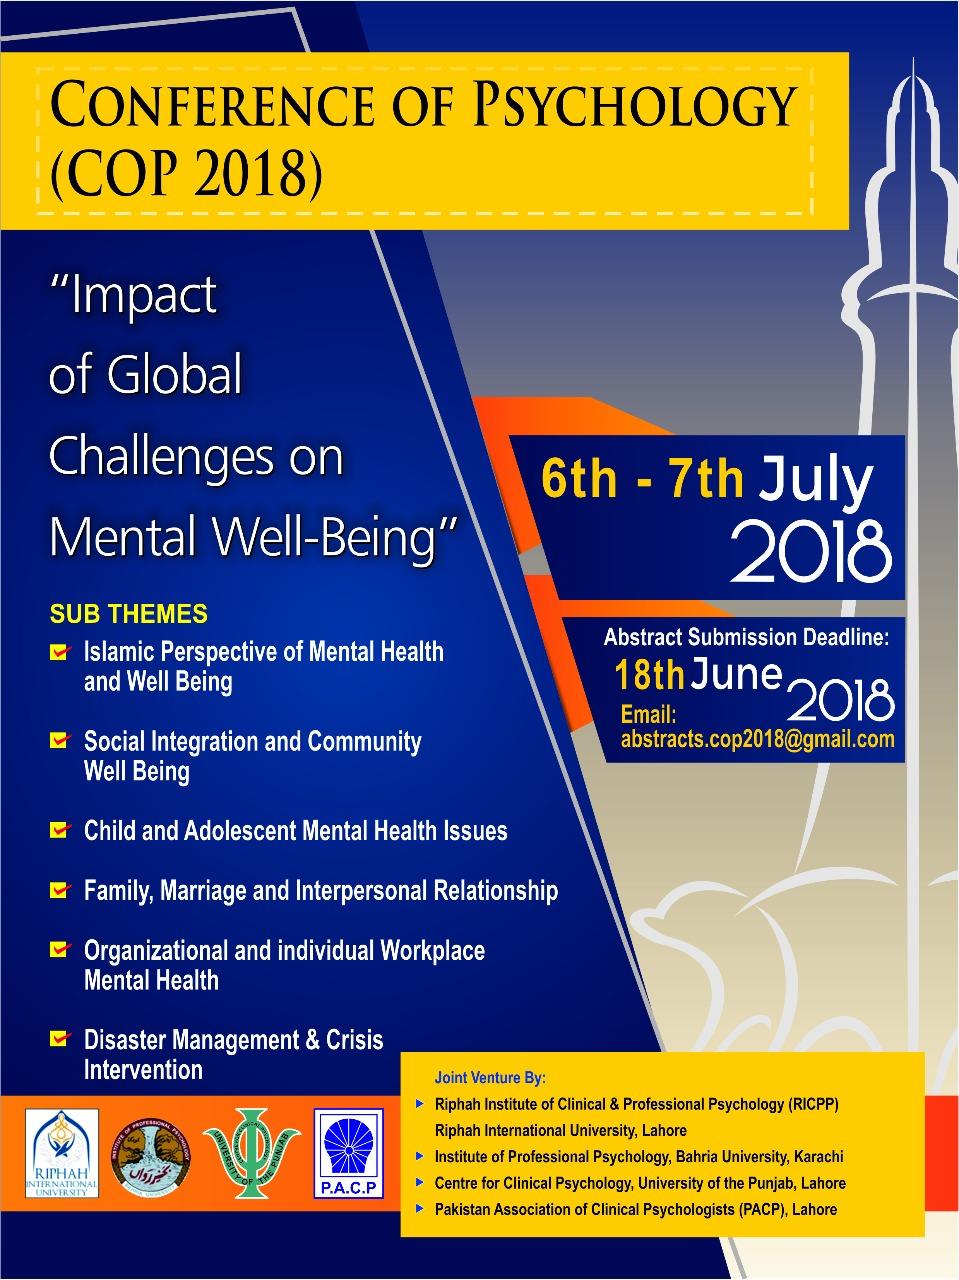 Conference of Psychology (COP 2018) - University of the Punjab